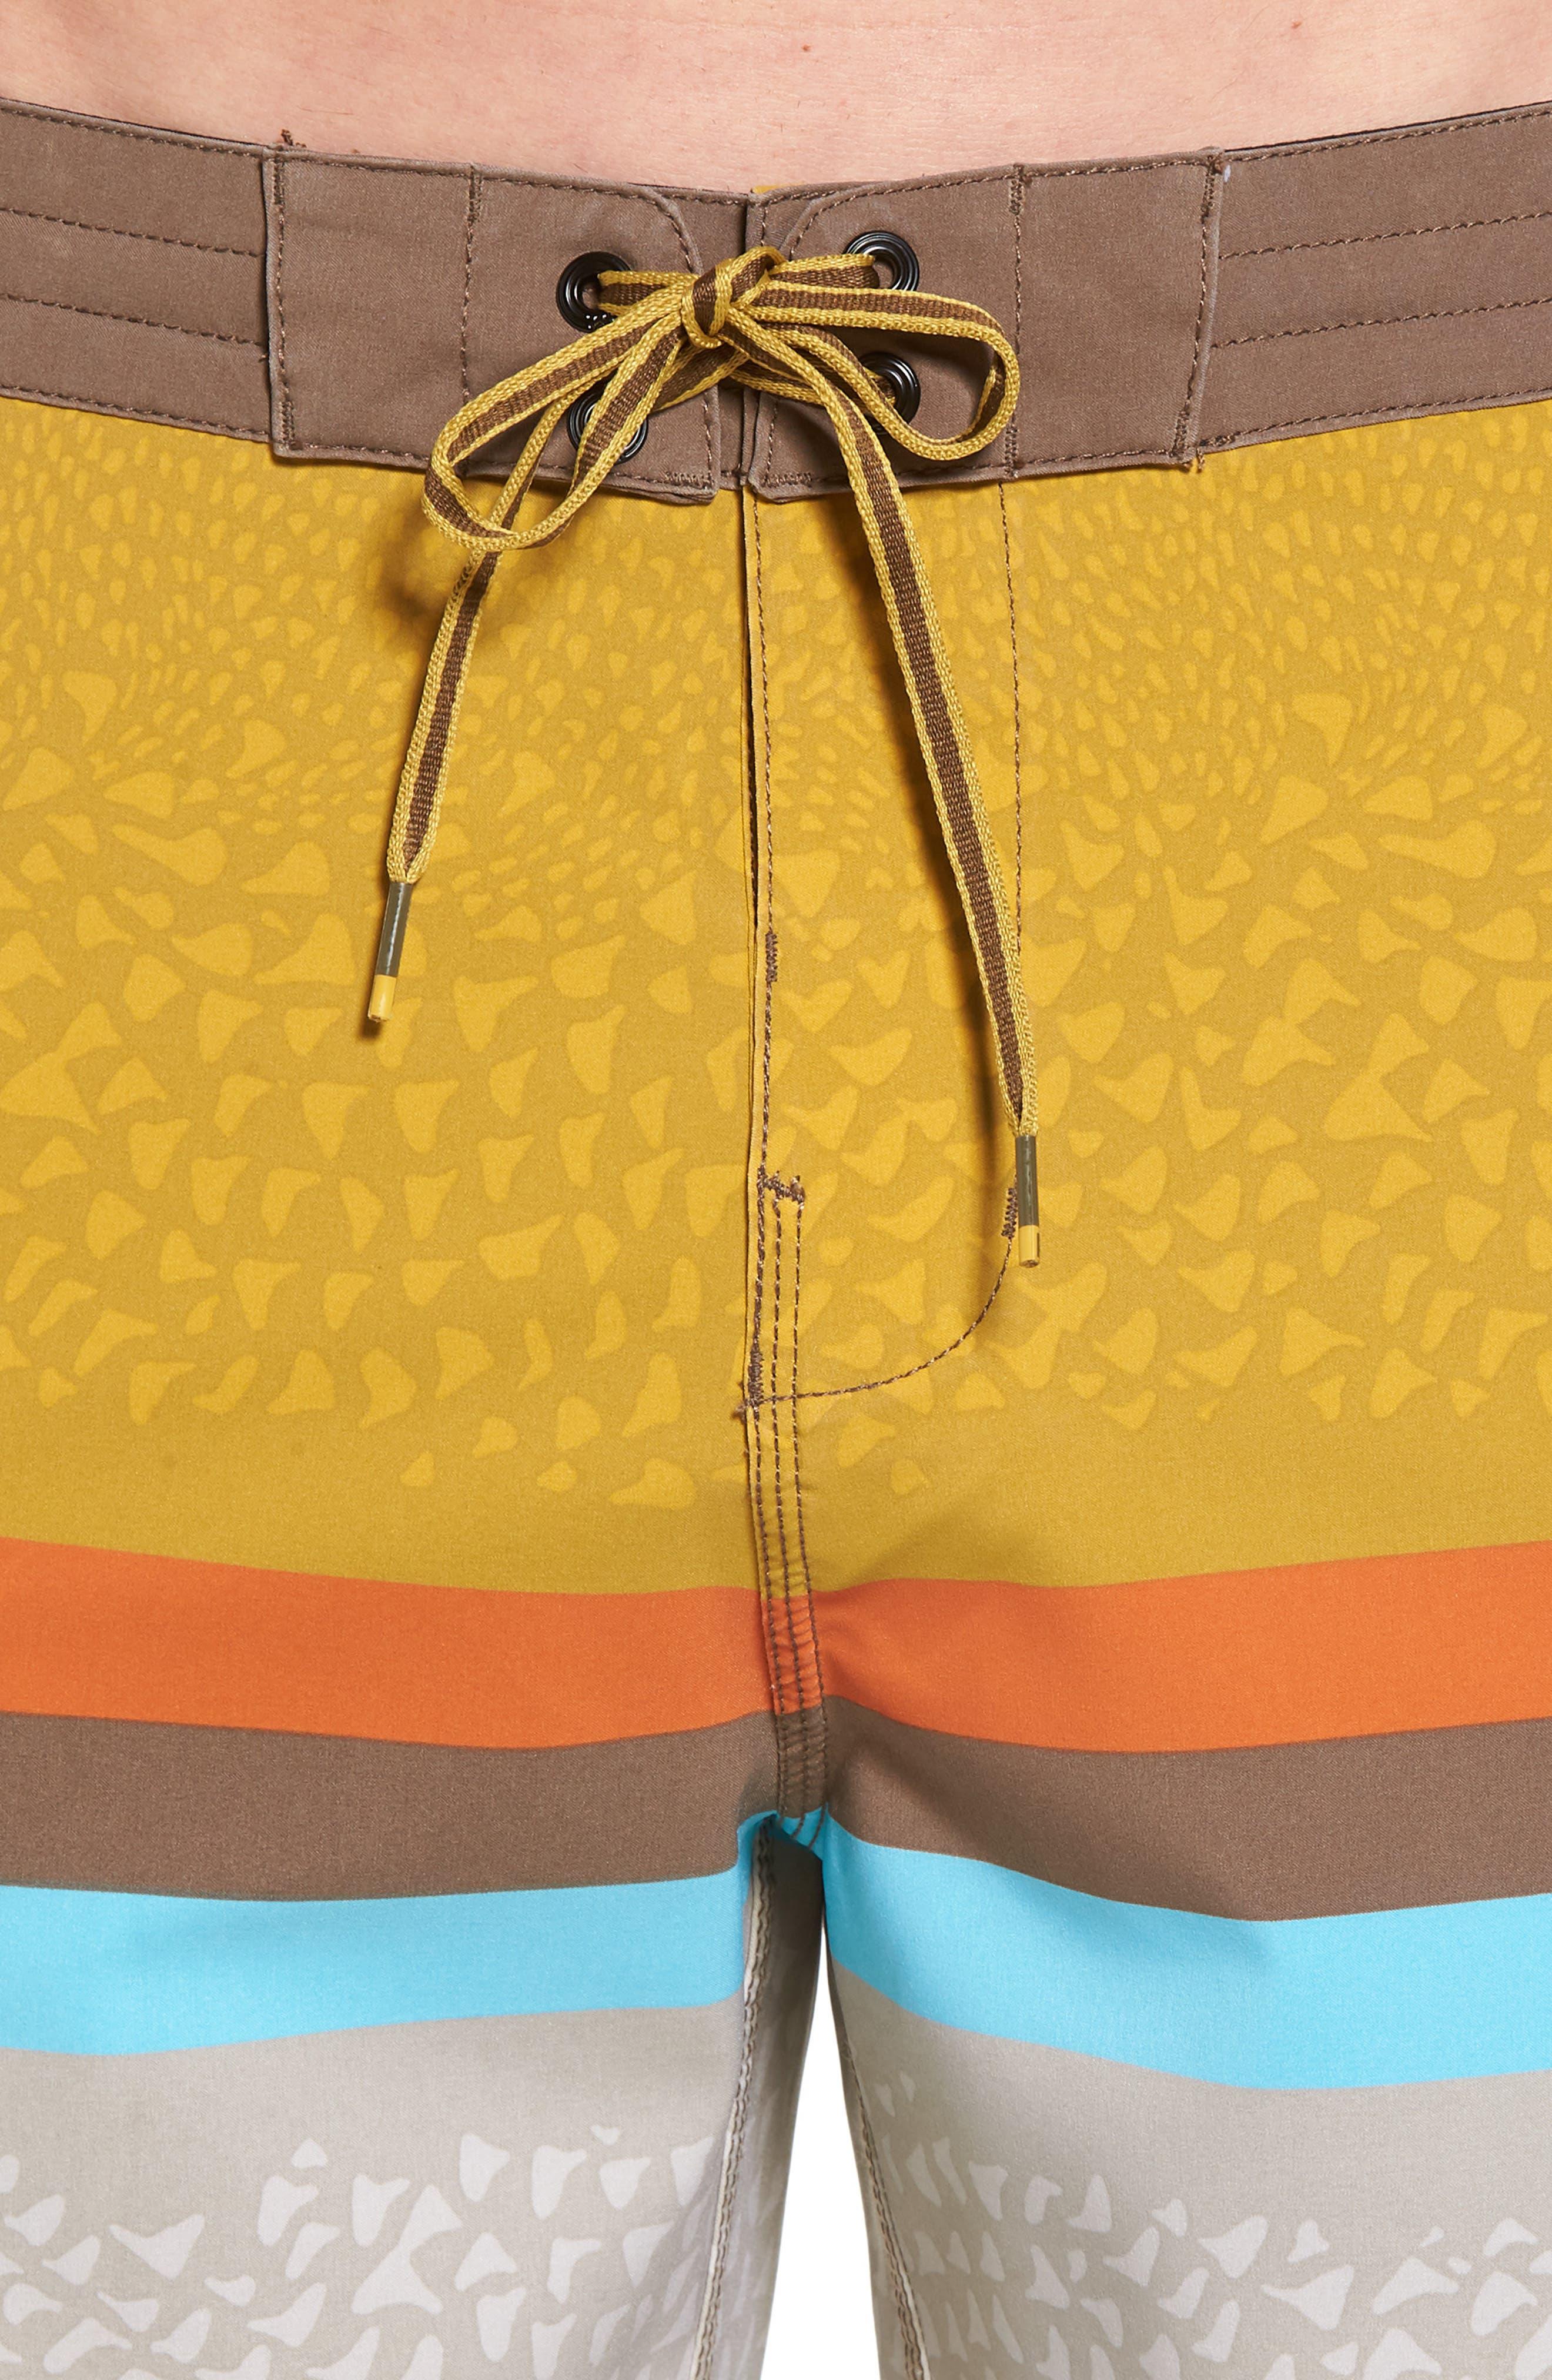 Fifty50 Low Tide Swim Trunks,                             Alternate thumbnail 4, color,                             Stone